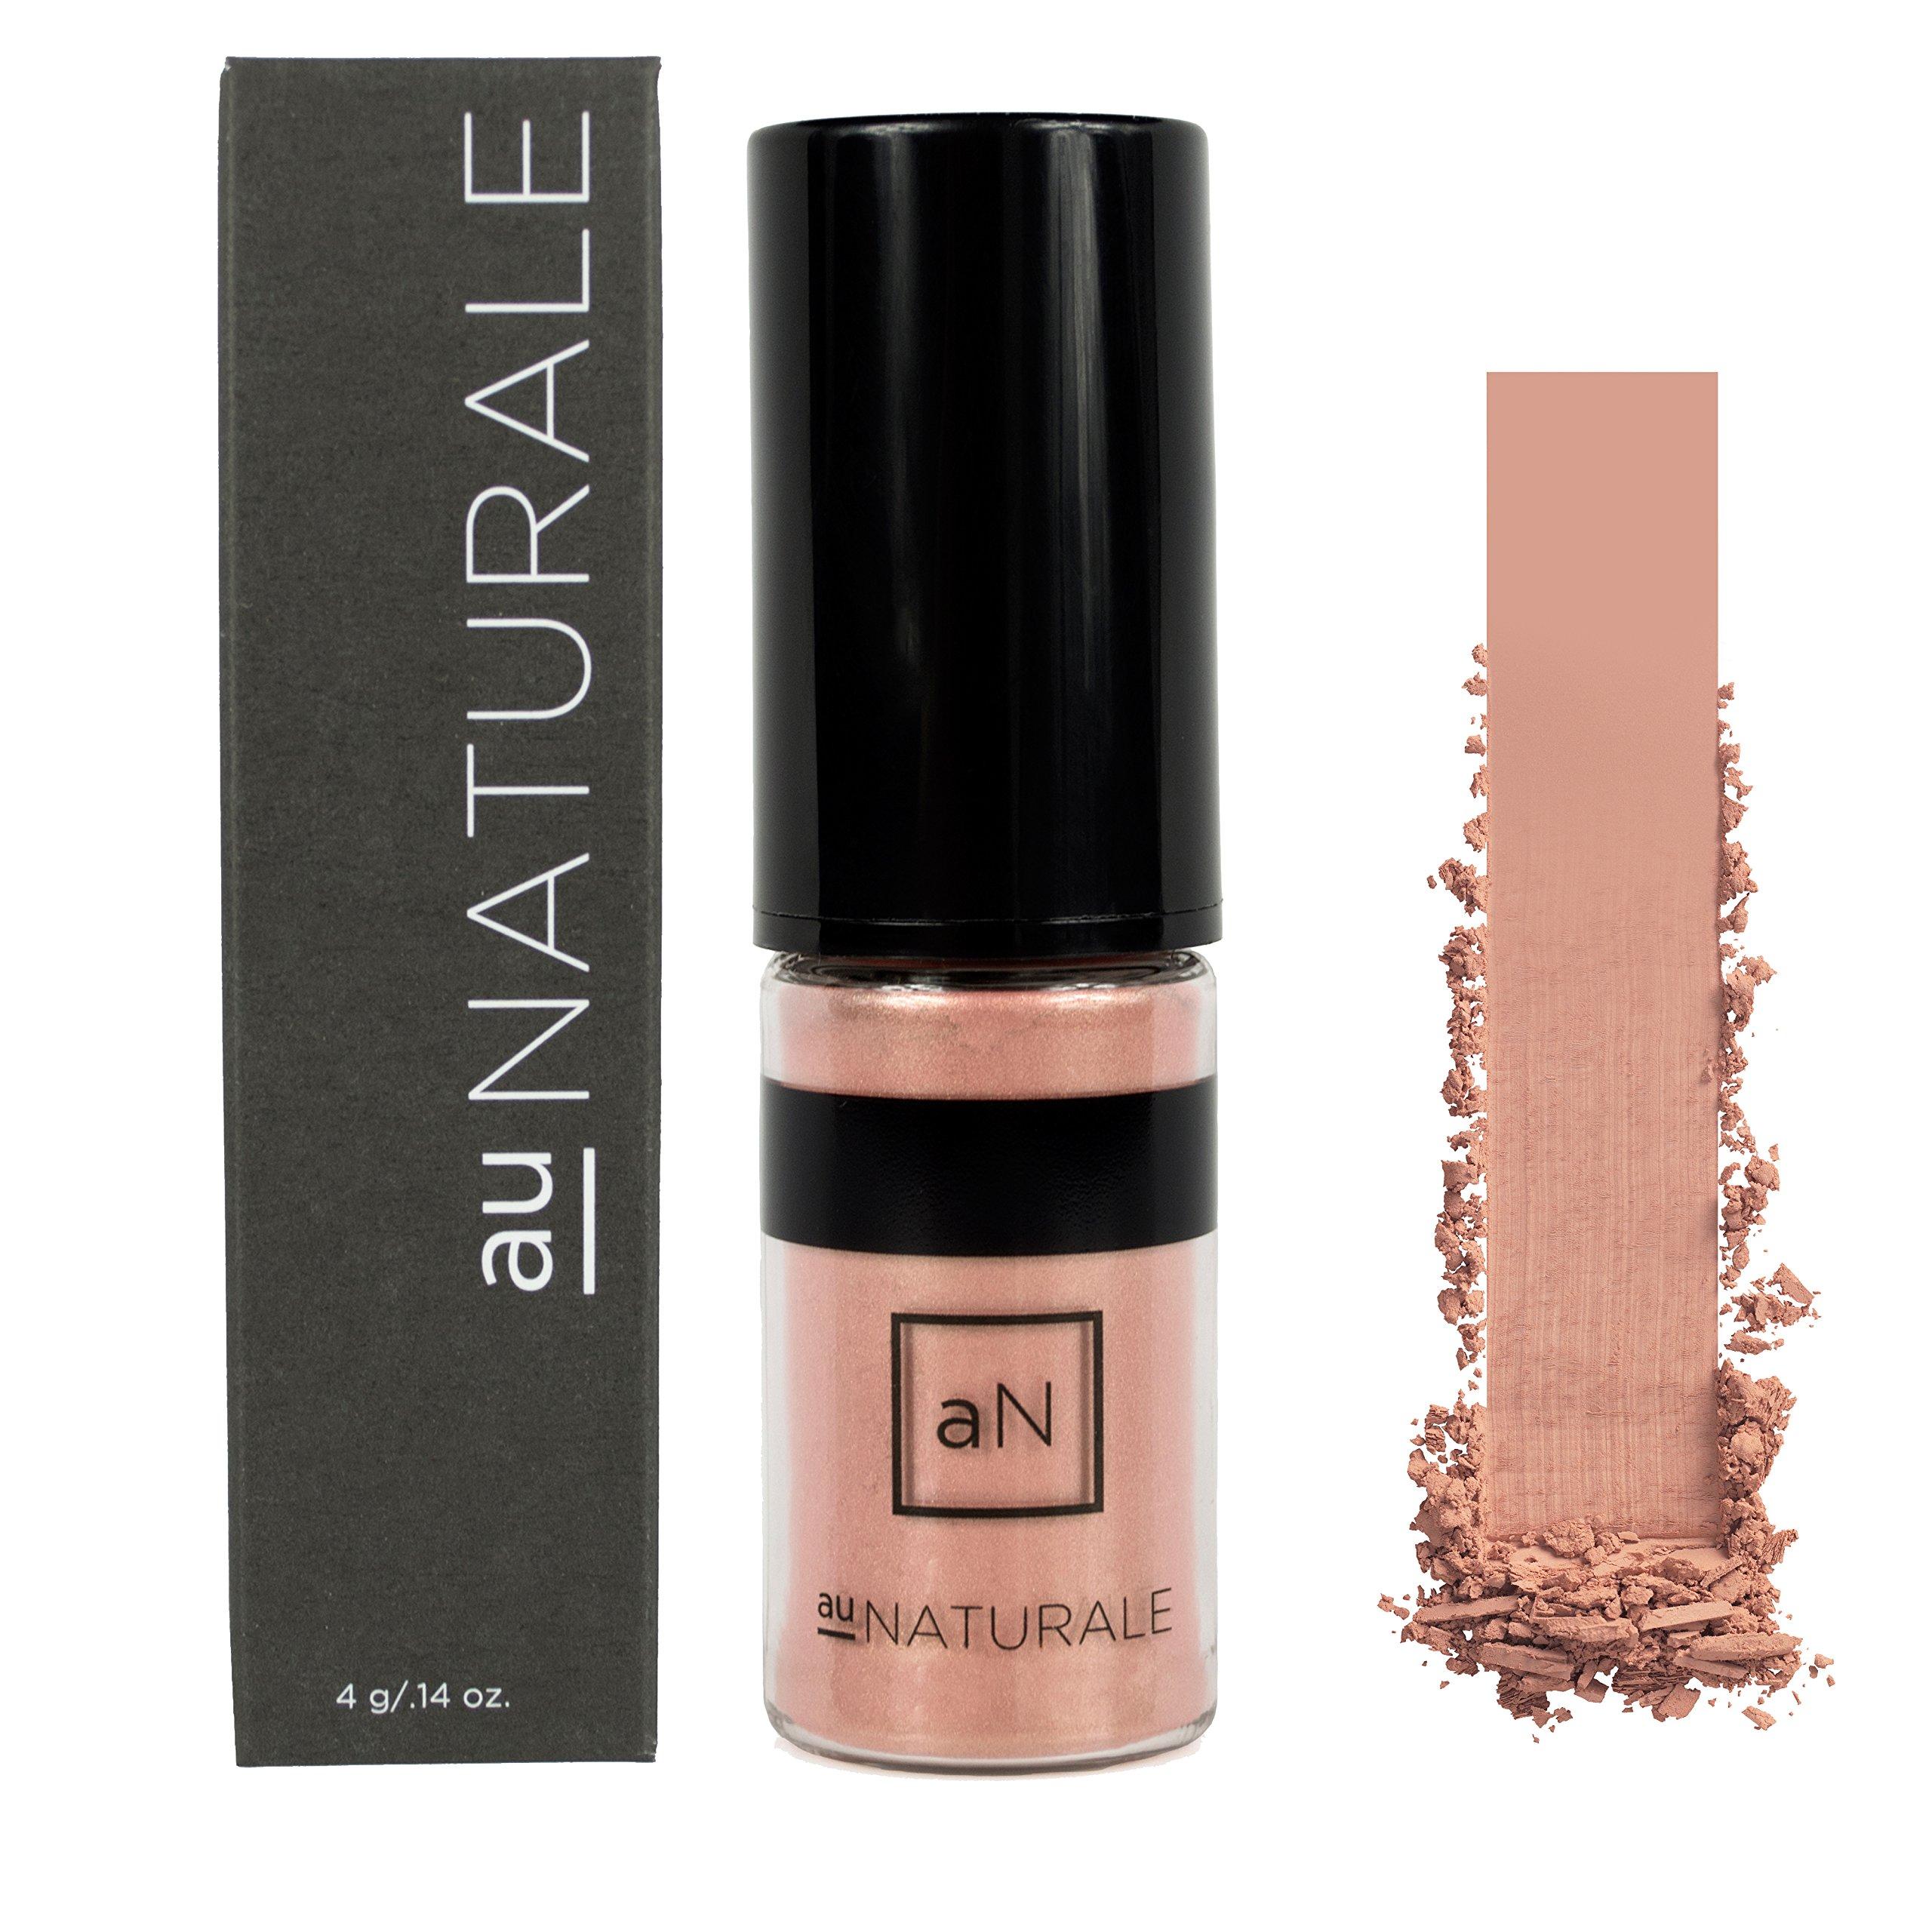 Beauty au natural blog giveaways